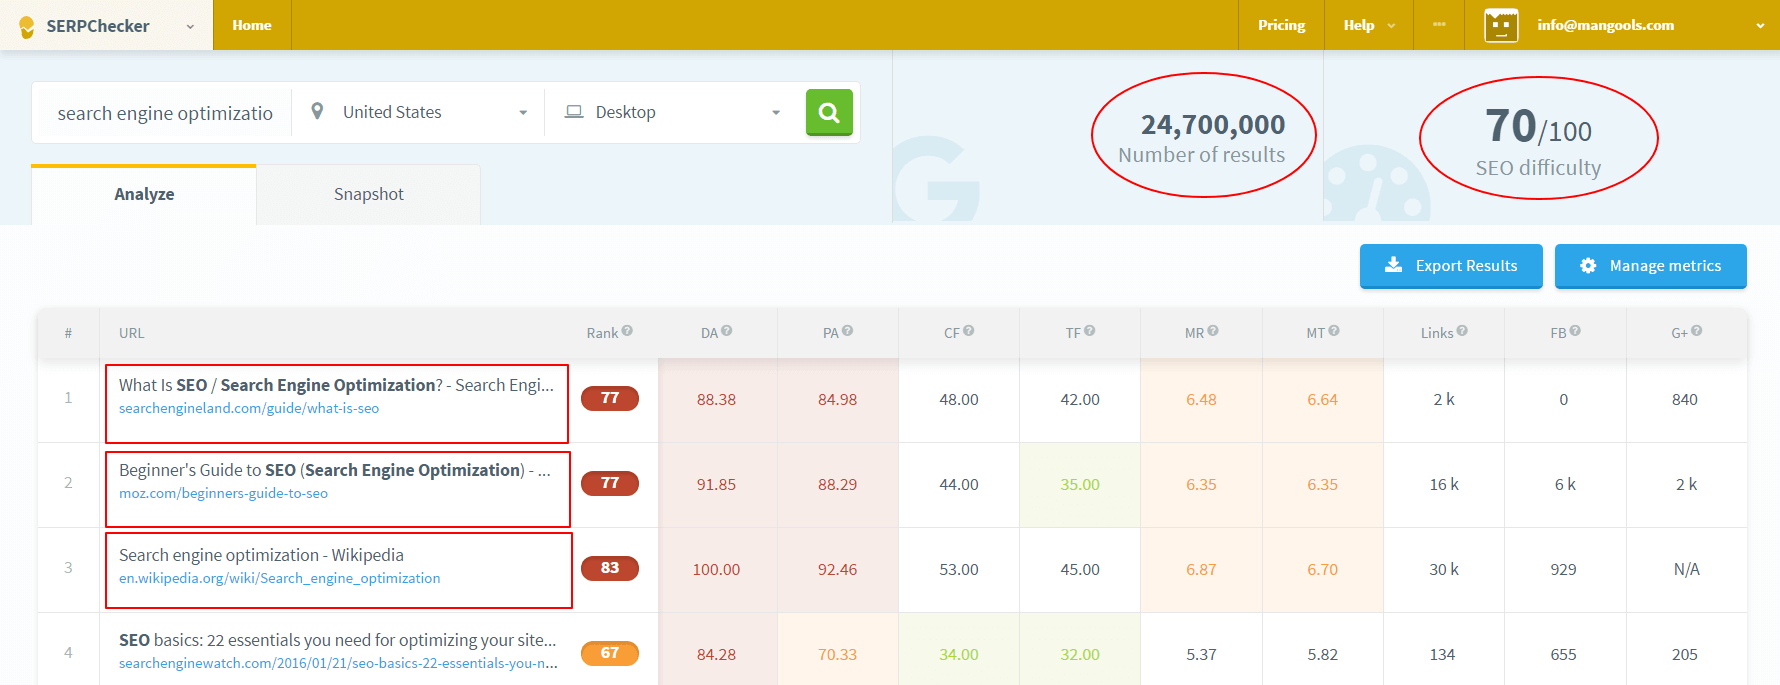 serpchecker seo competitor analysis guide